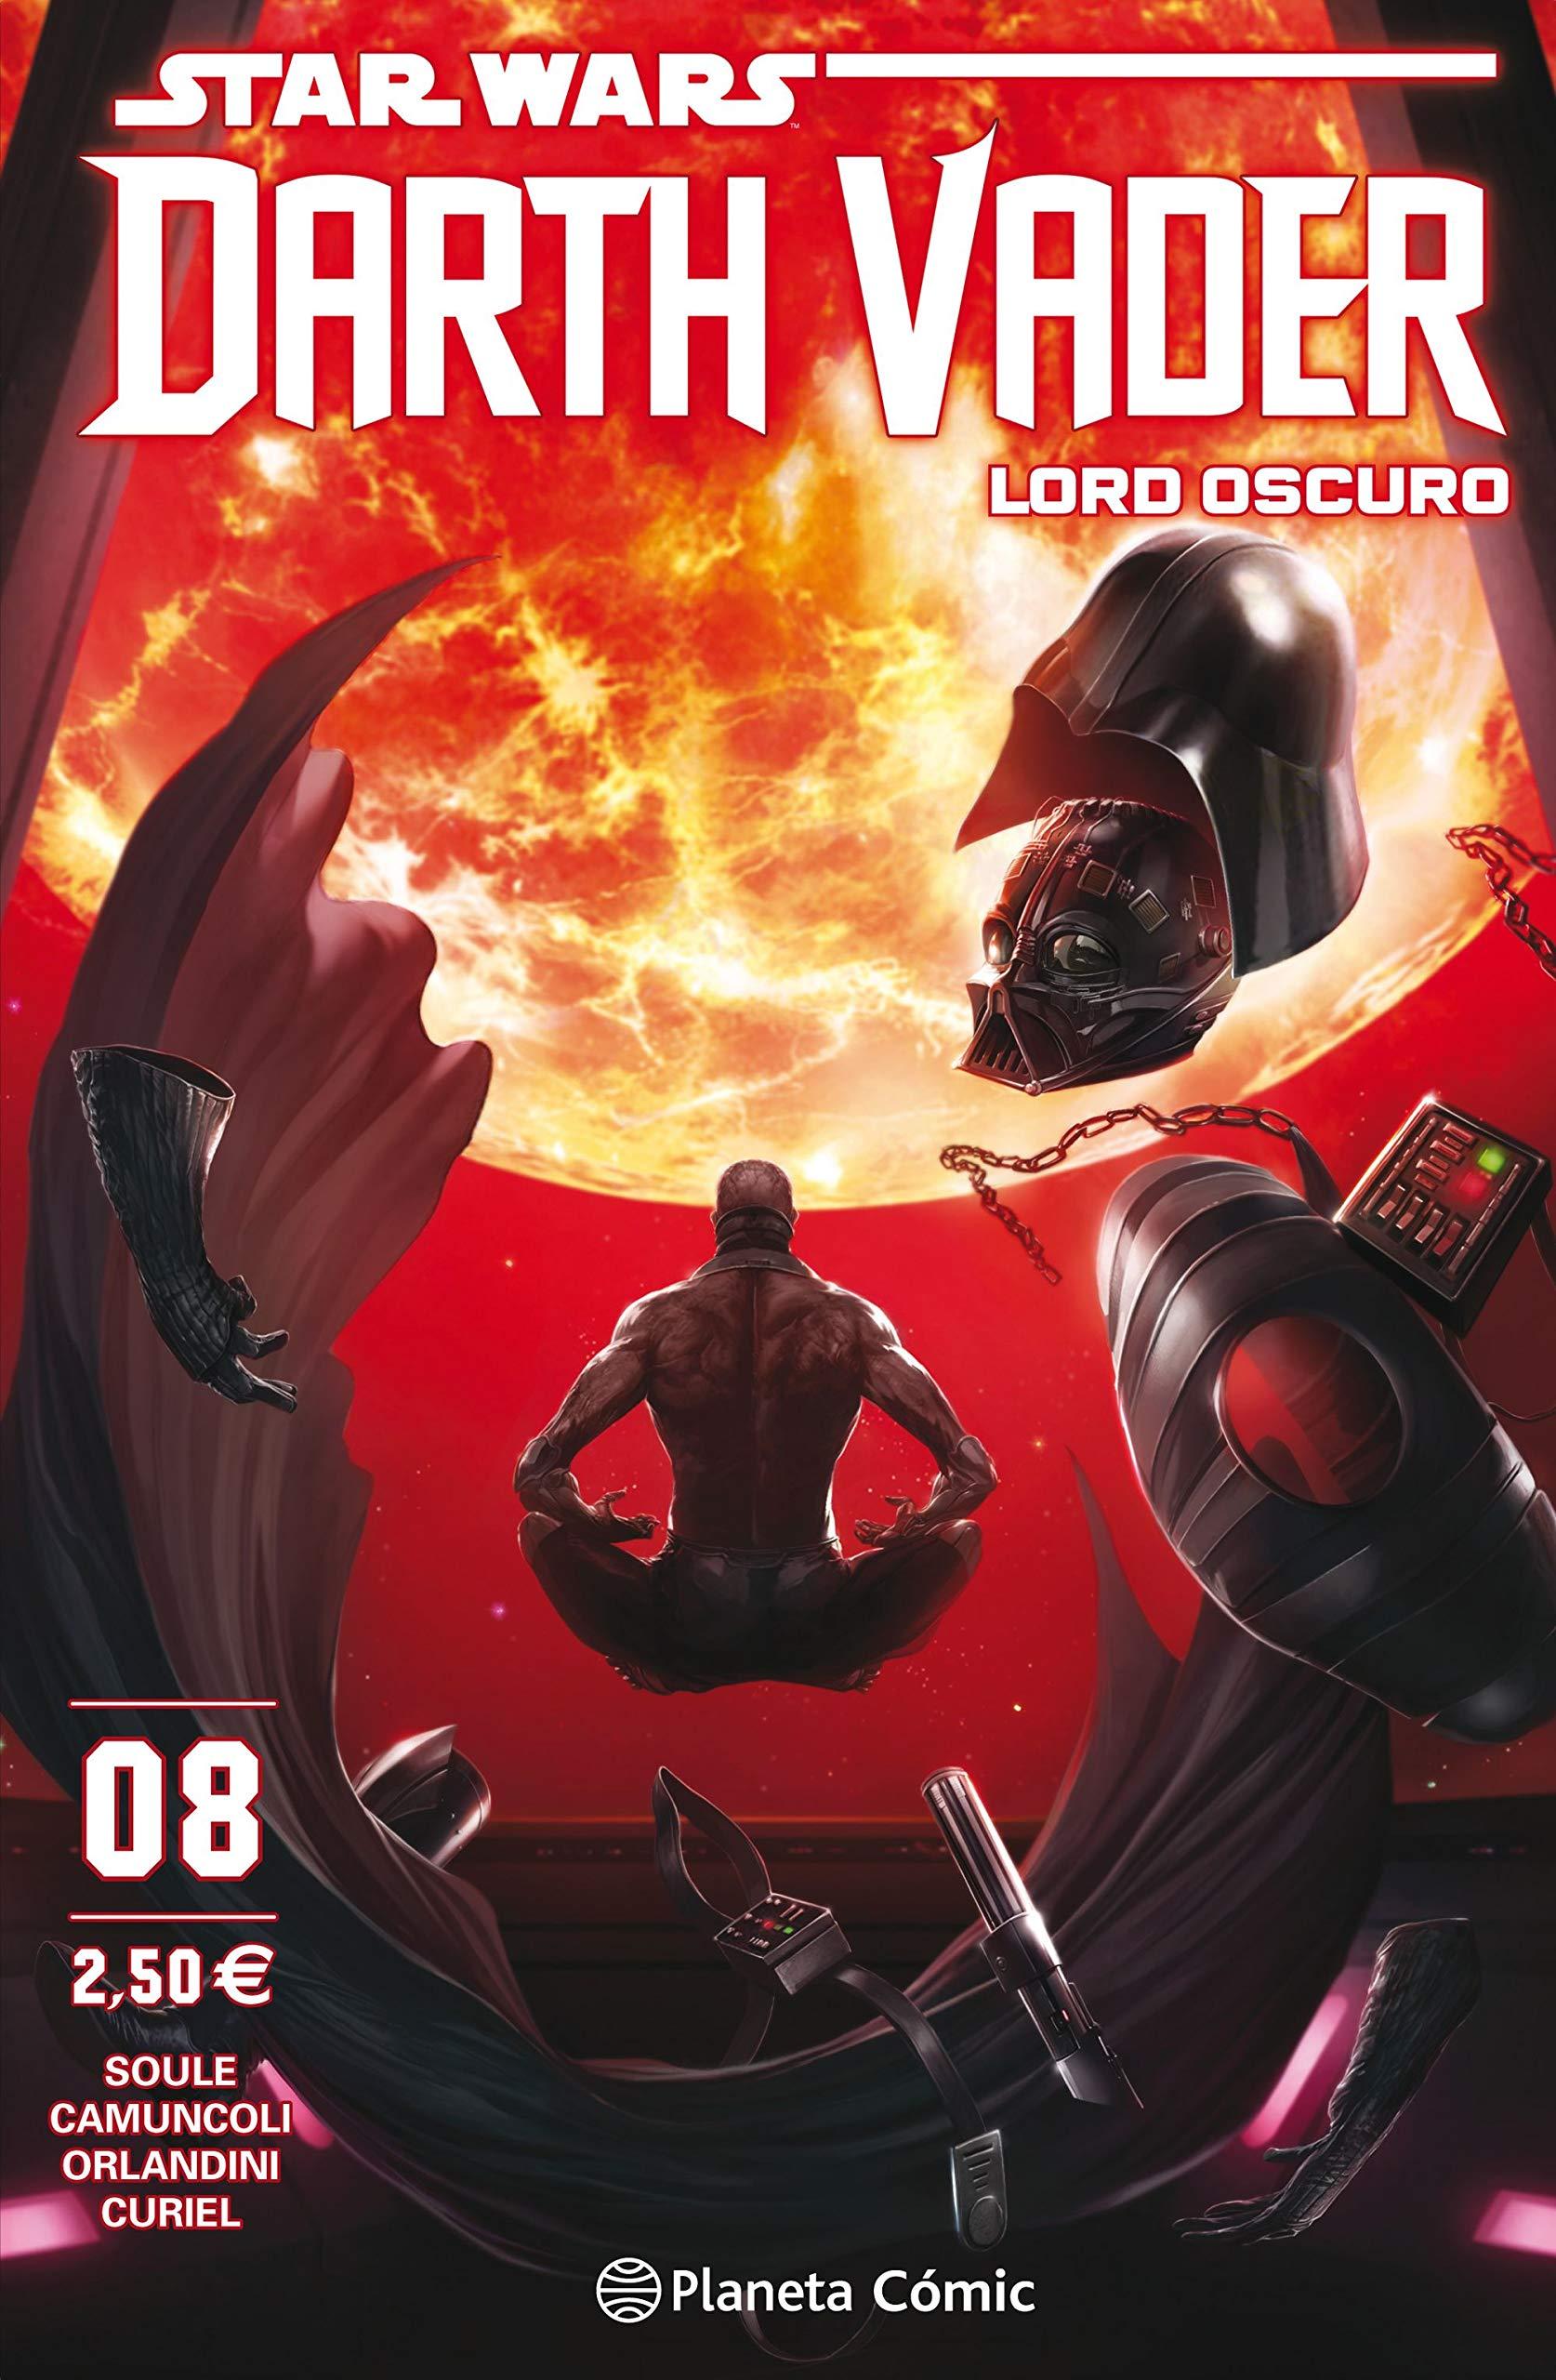 Star Wars Darth Vader Lord Oscuro nº 08 (Star Wars: Cómics Grapa Marvel) Tapa blanda – 27 nov 2018 Charles Soule Giuseppe Camuncoli Planeta DeAgostini Cómics 8491469087